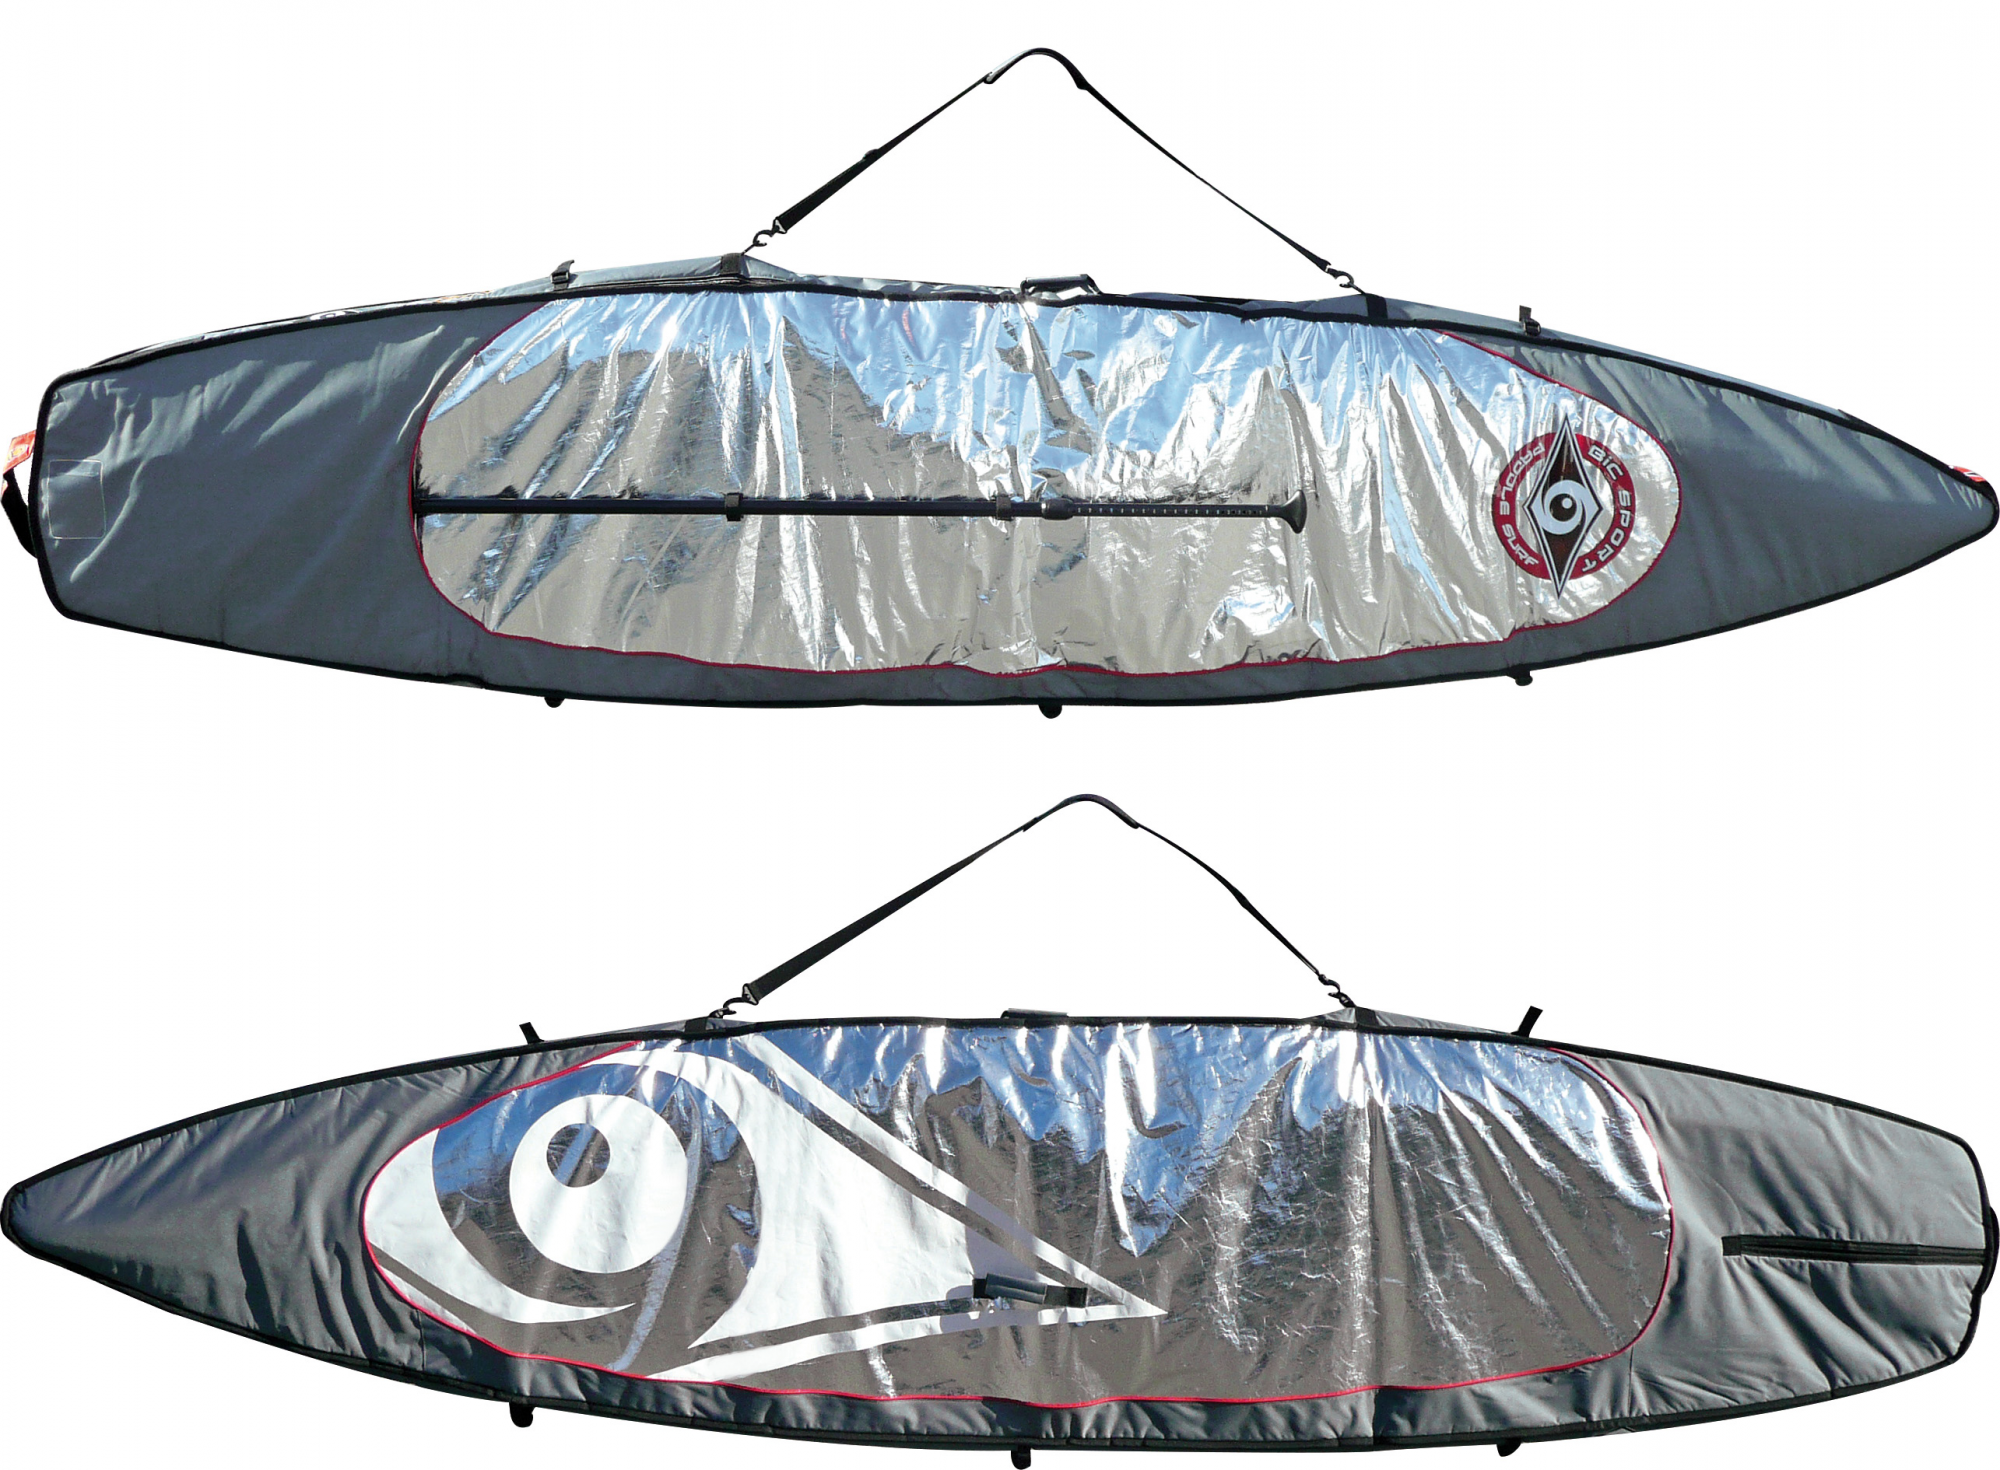 BIC SUP Board Bag Touring